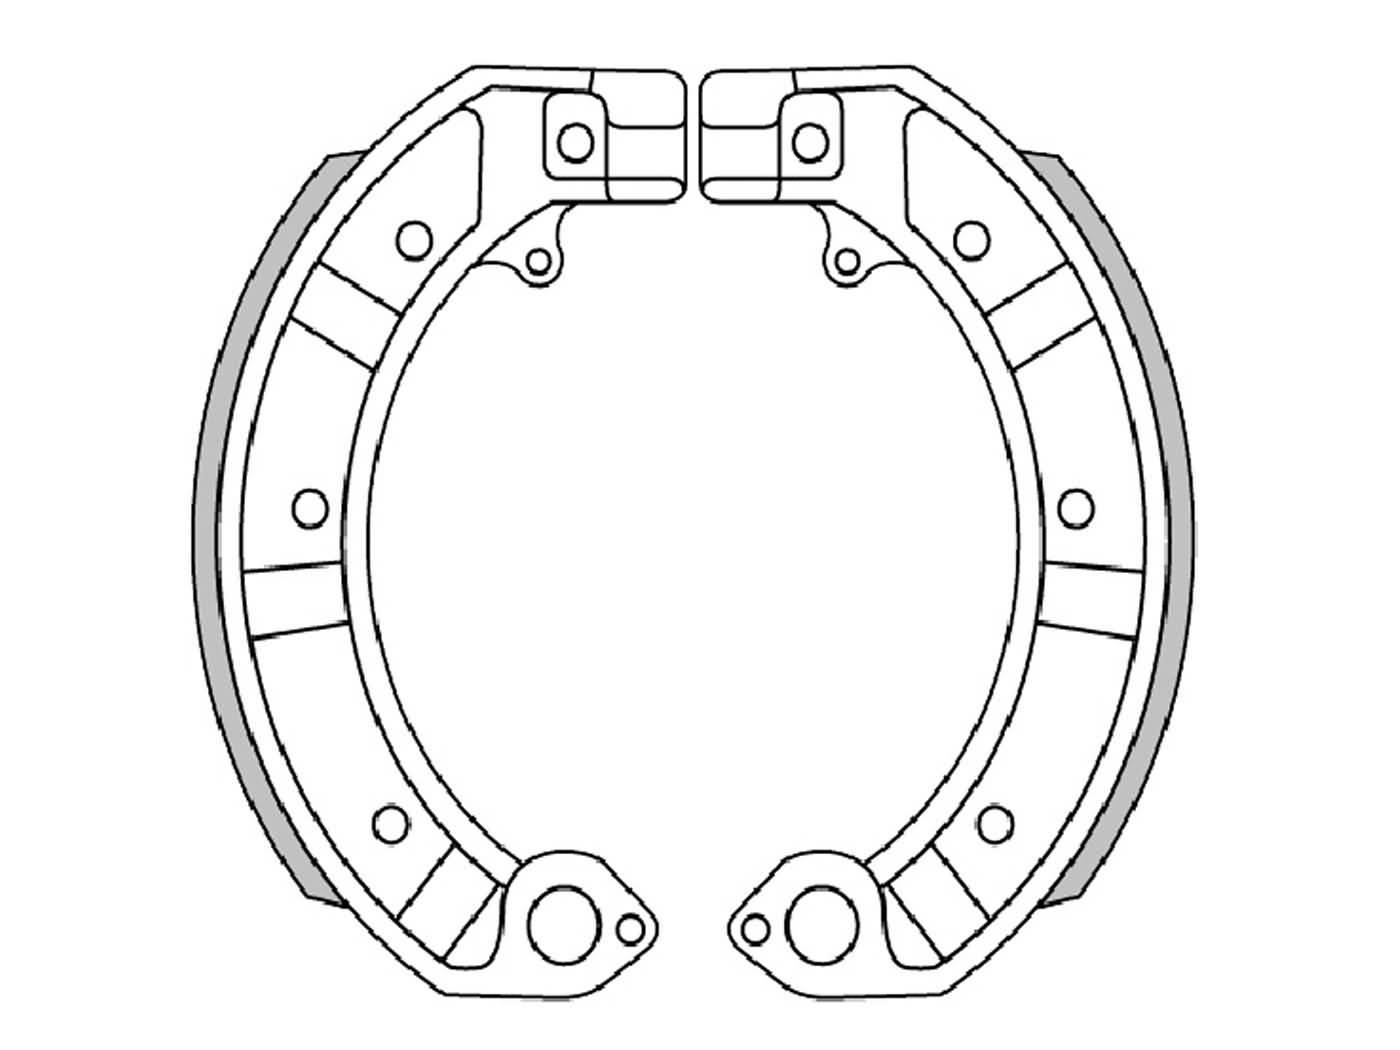 brake shoe set Polini 150x24mm for drum brake for Vespa PK